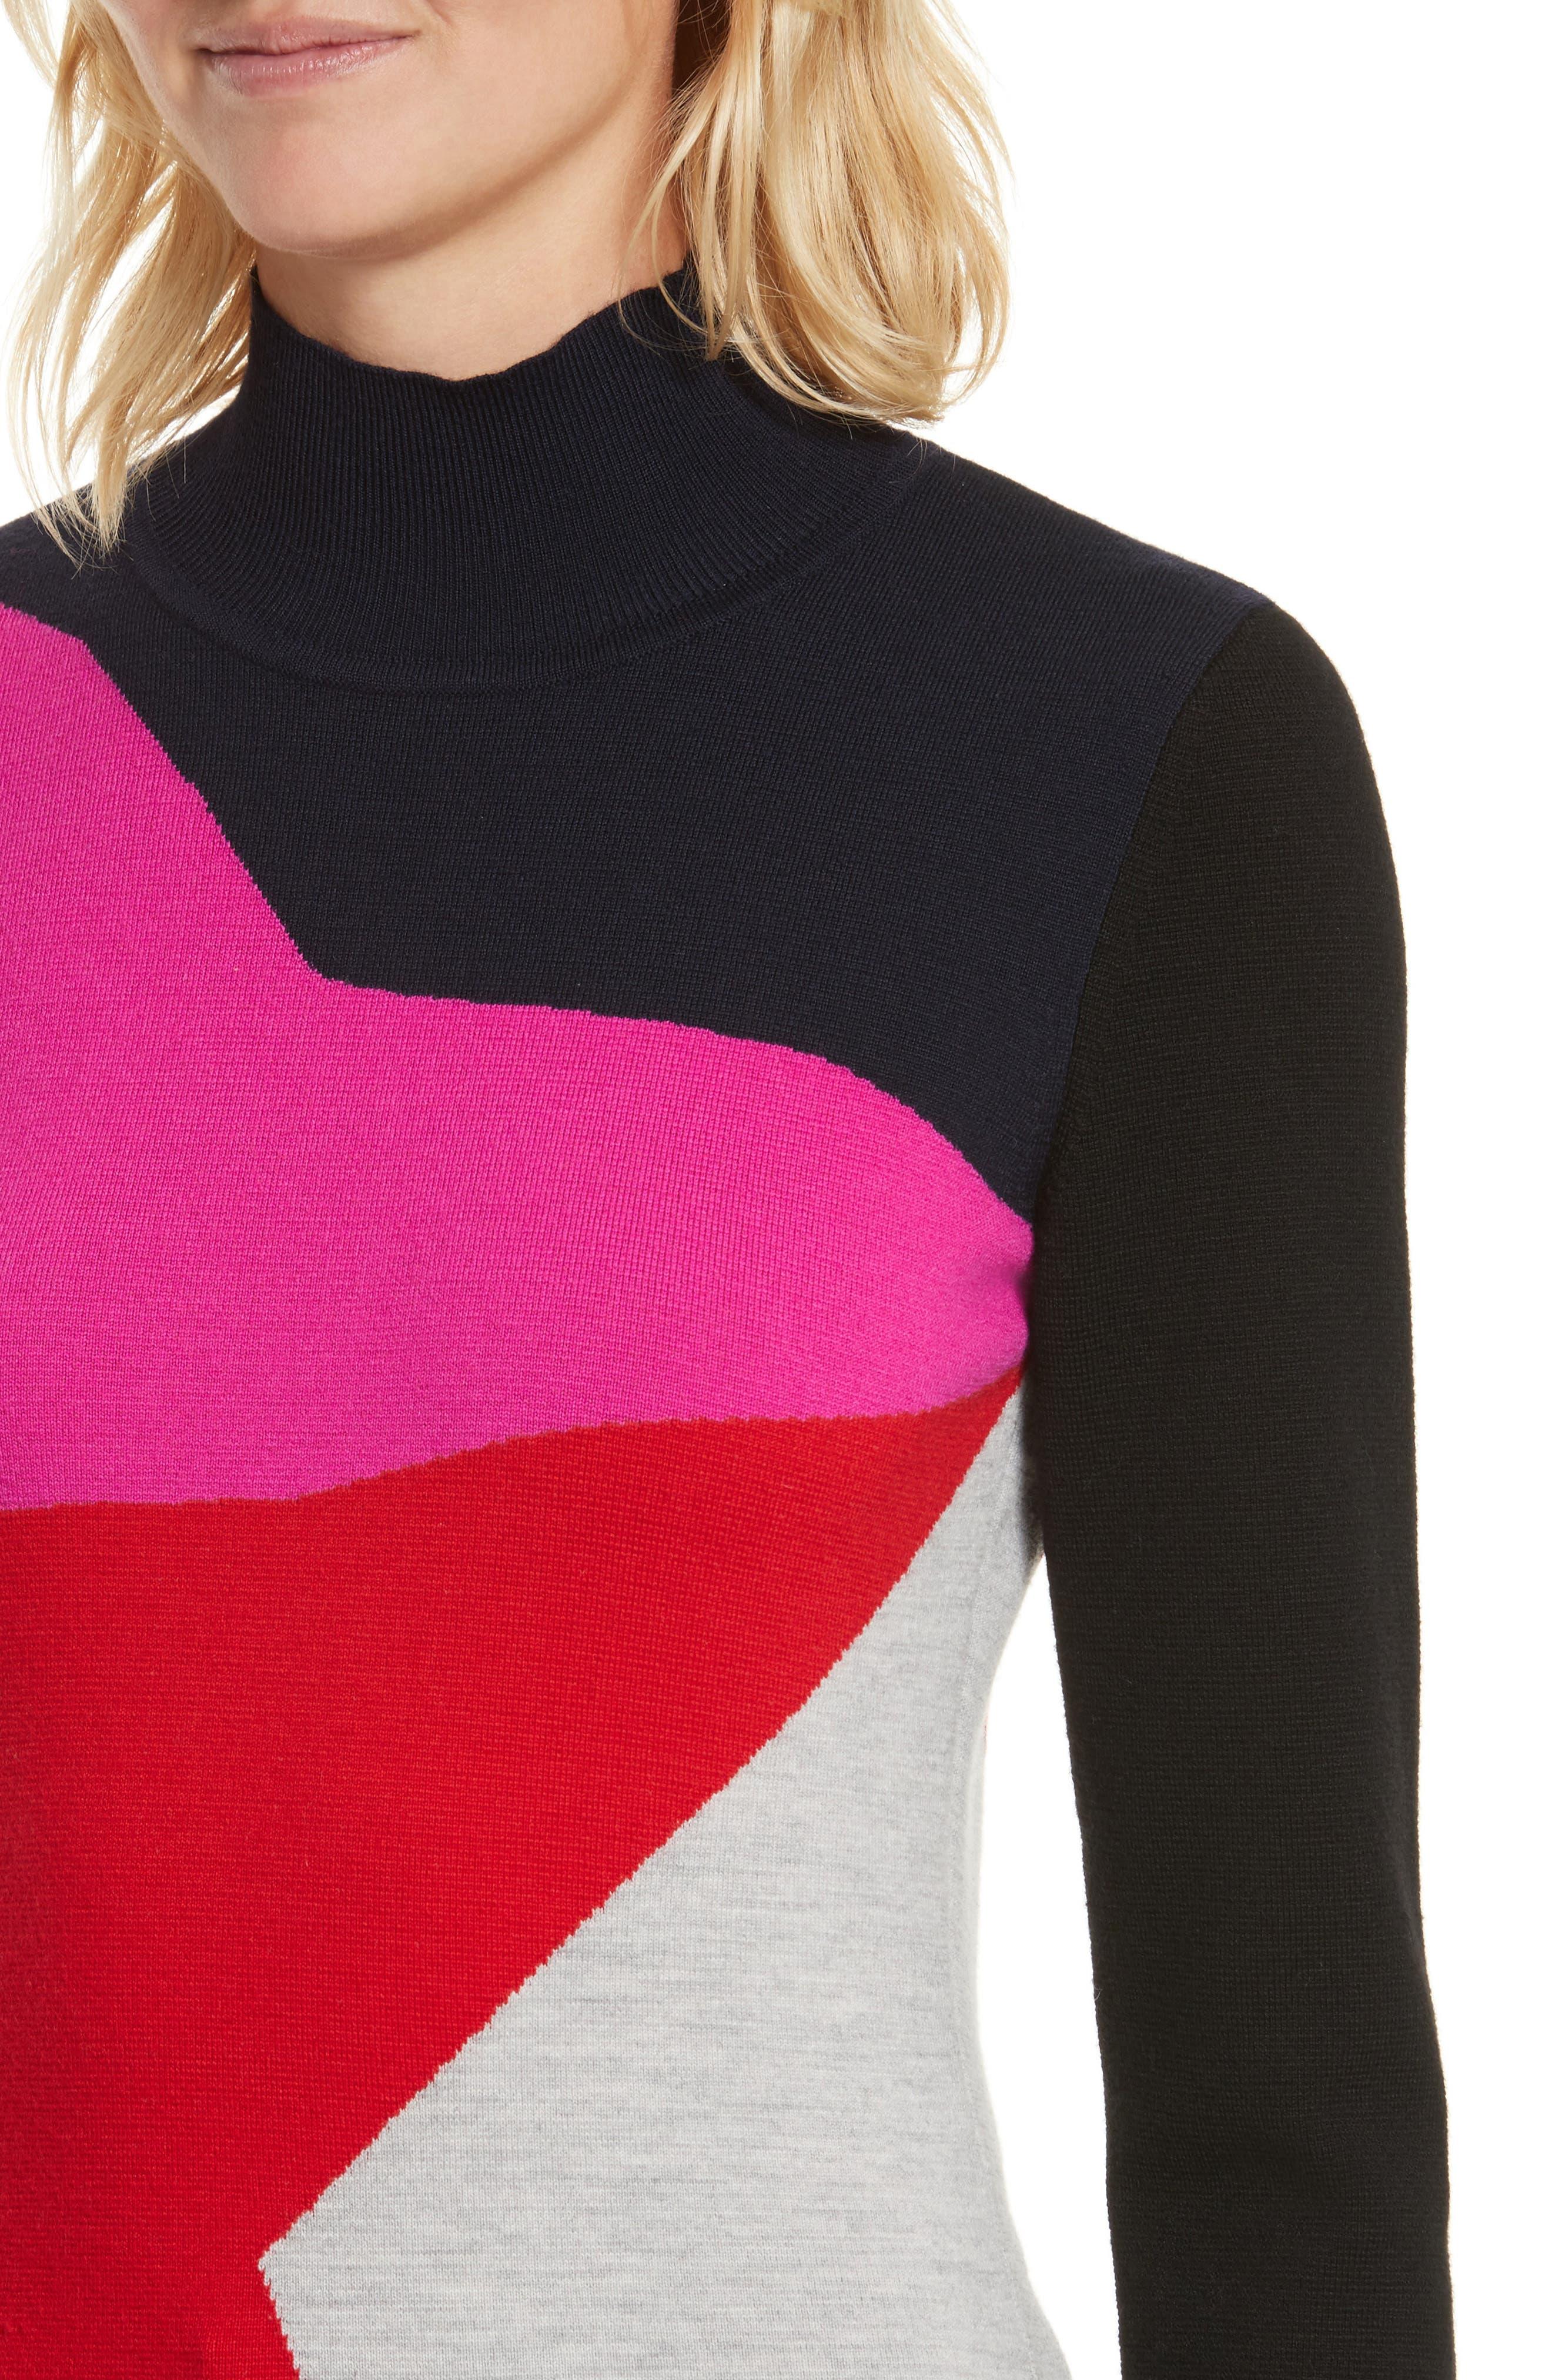 Diane von Furstenberg Colorblock Turtleneck Pullover,                             Alternate thumbnail 4, color,                             642